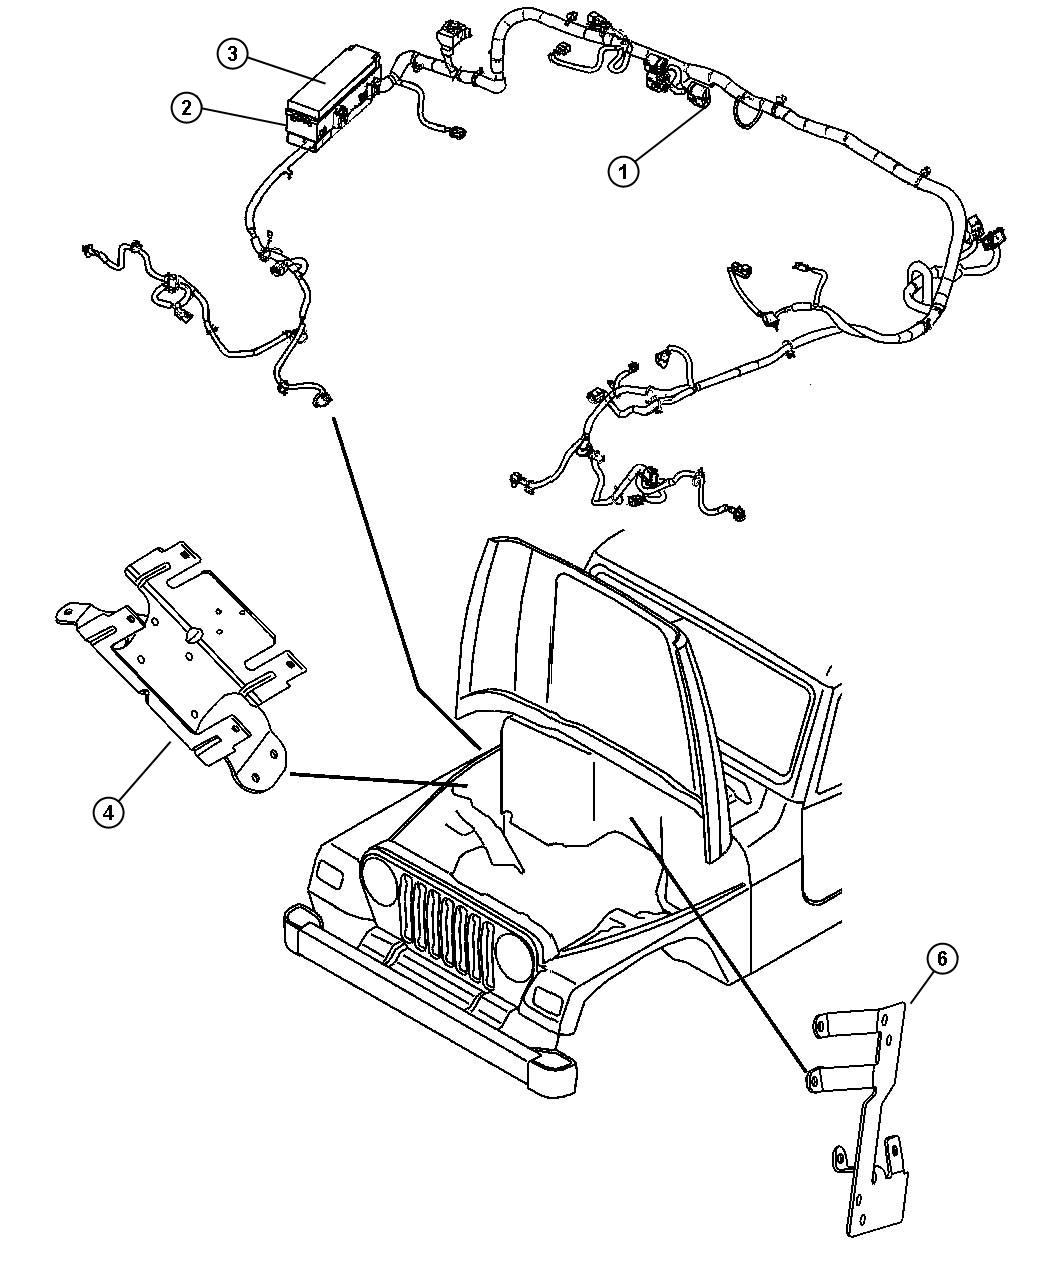 2003 Jeep Wrangler Bracket. Wiring harness. Side cowl